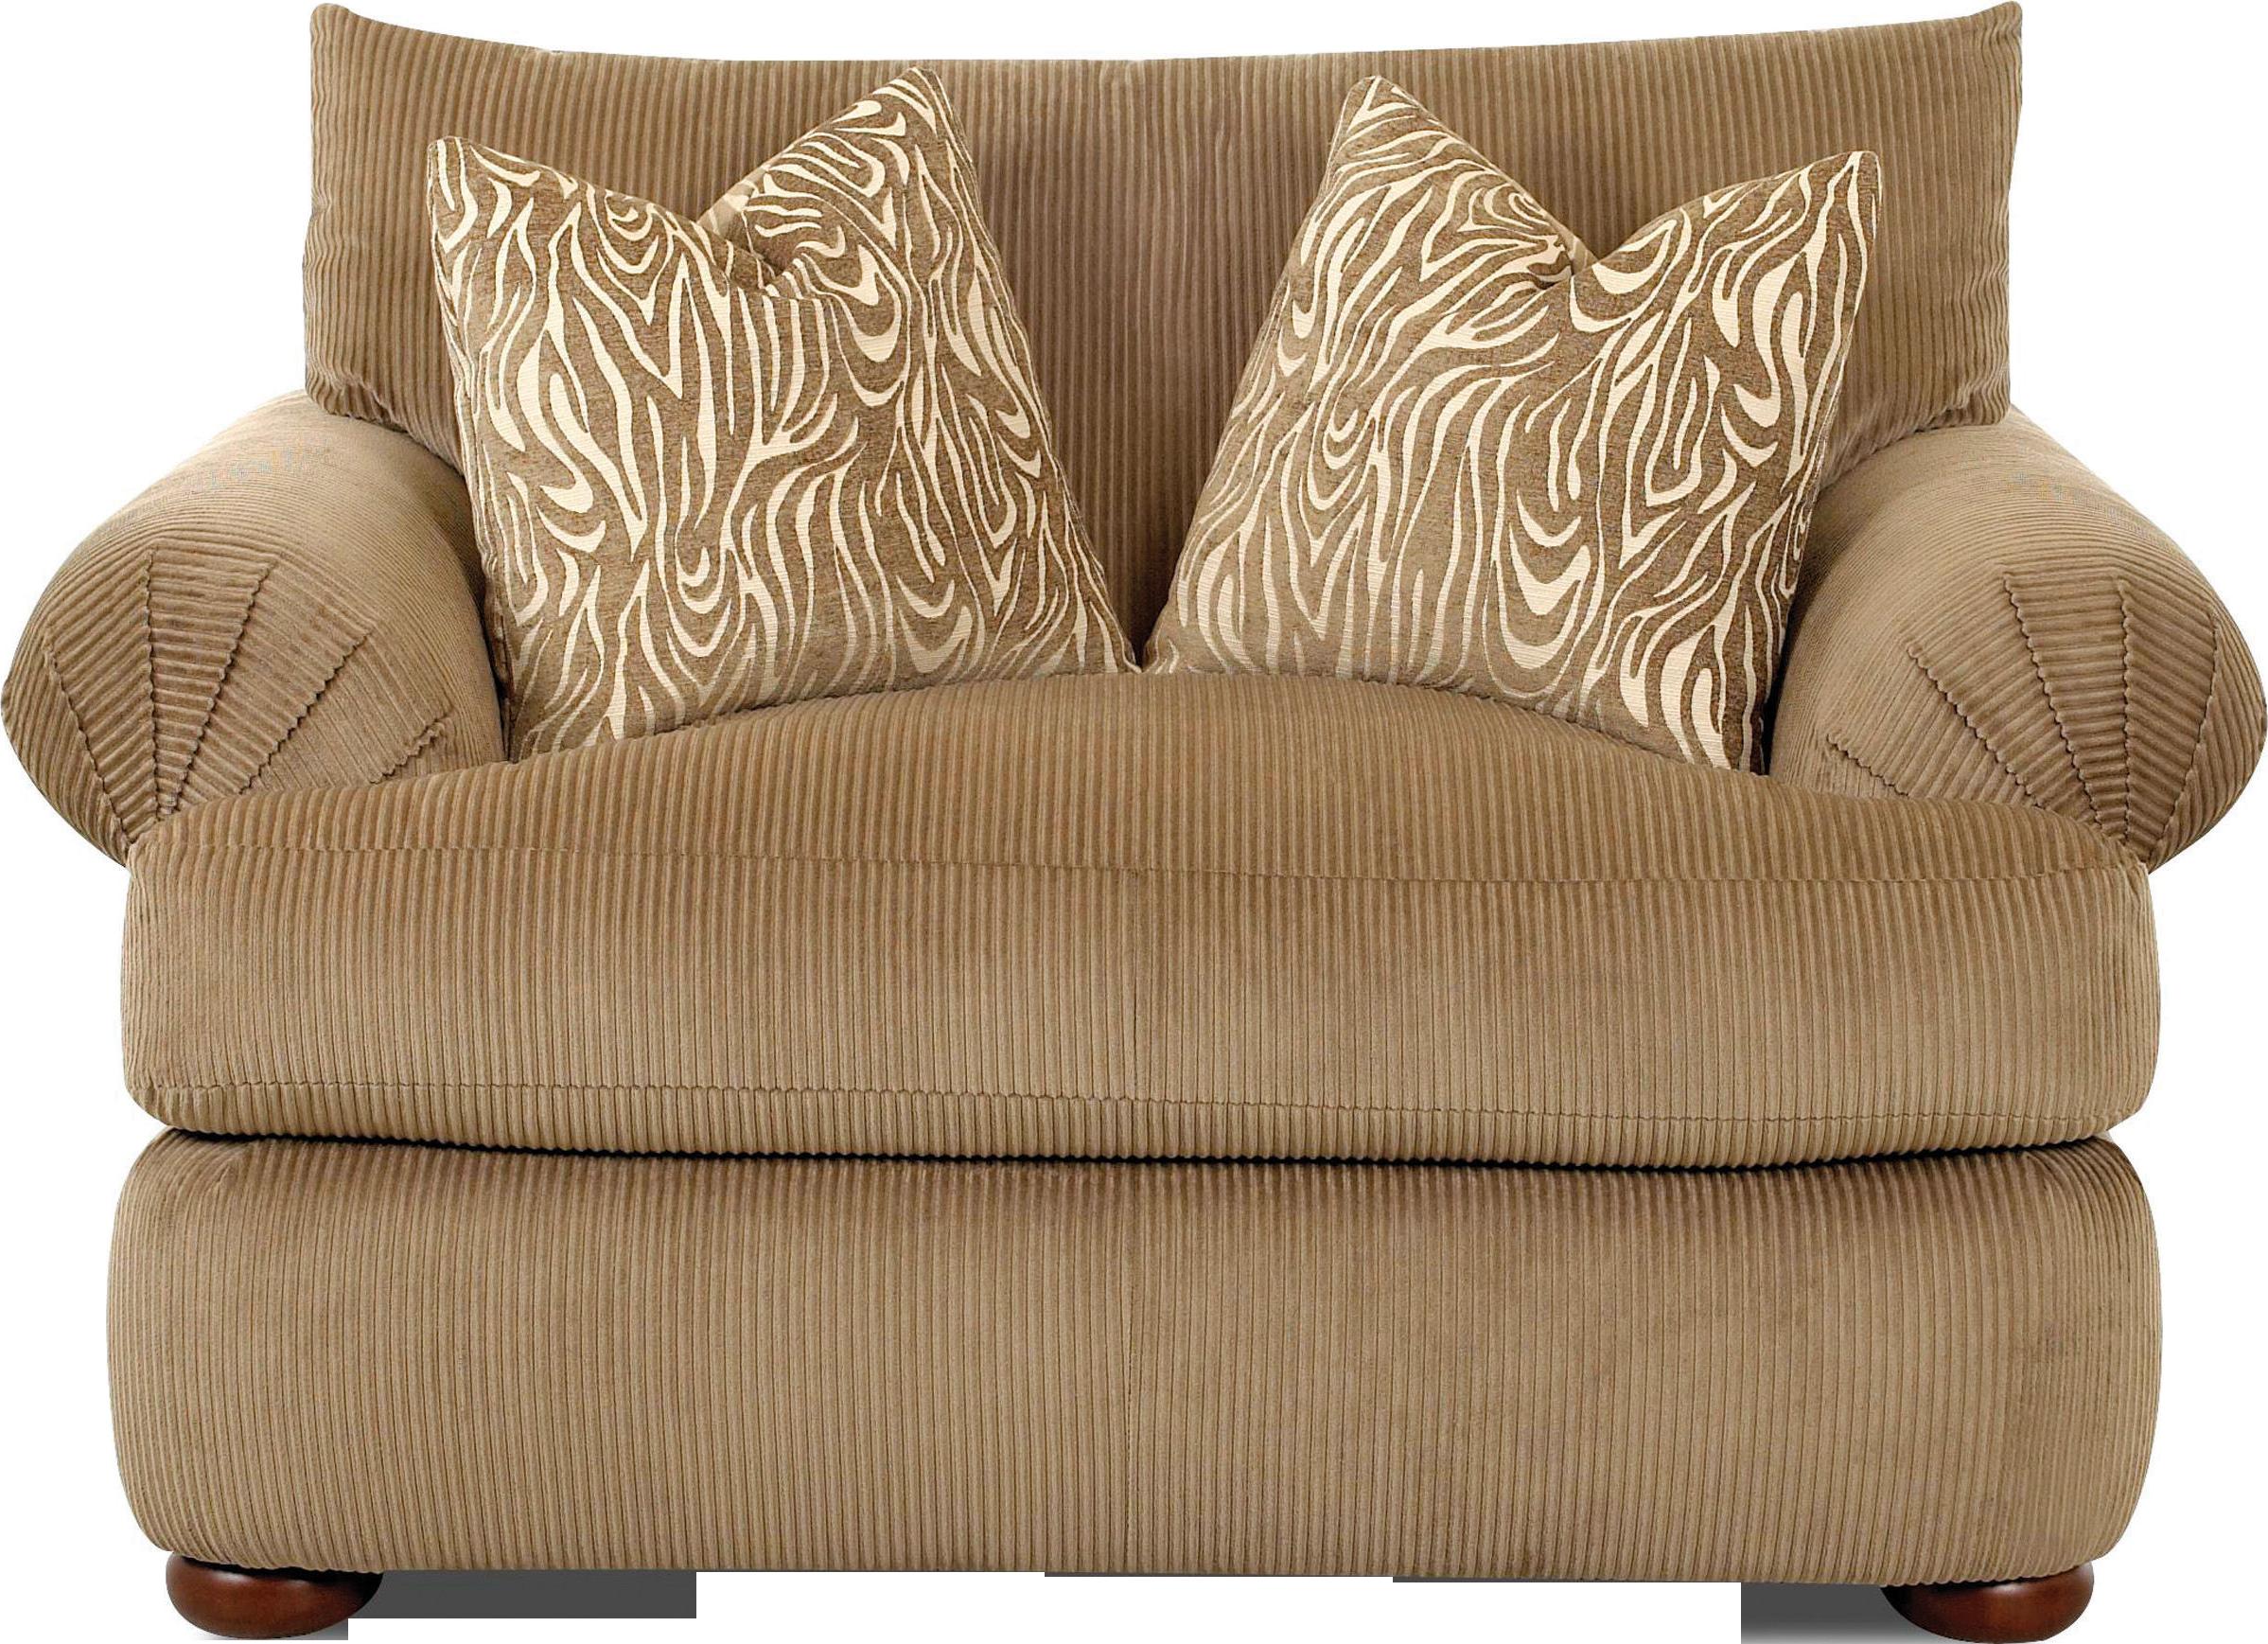 Furniture png transparent furniture png images pluspng - Image furniture ...